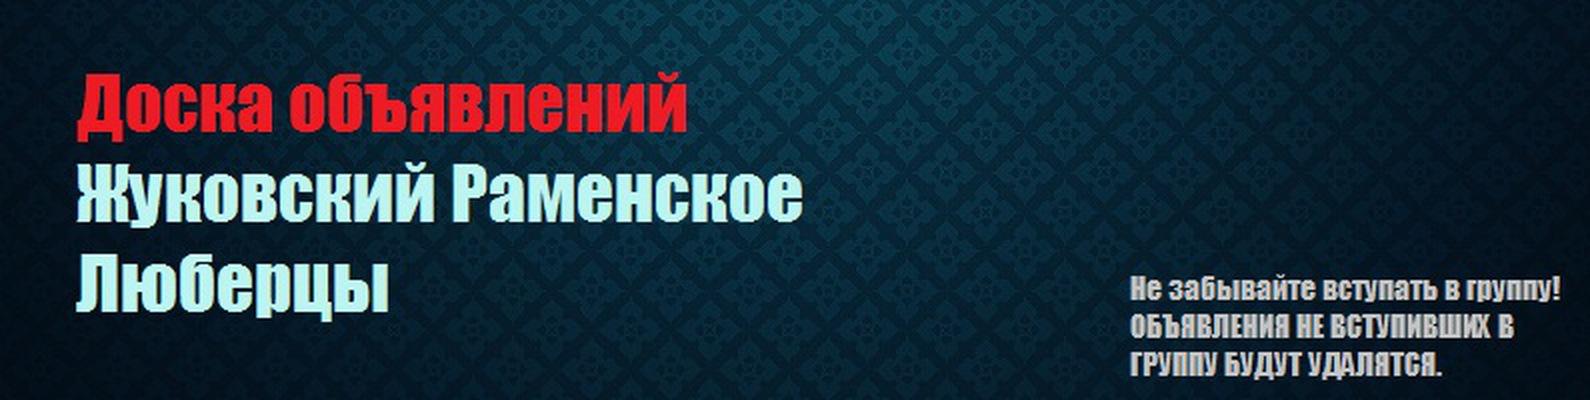 хостела Фэмили доска бесплатных объявлений жуковский Підручники